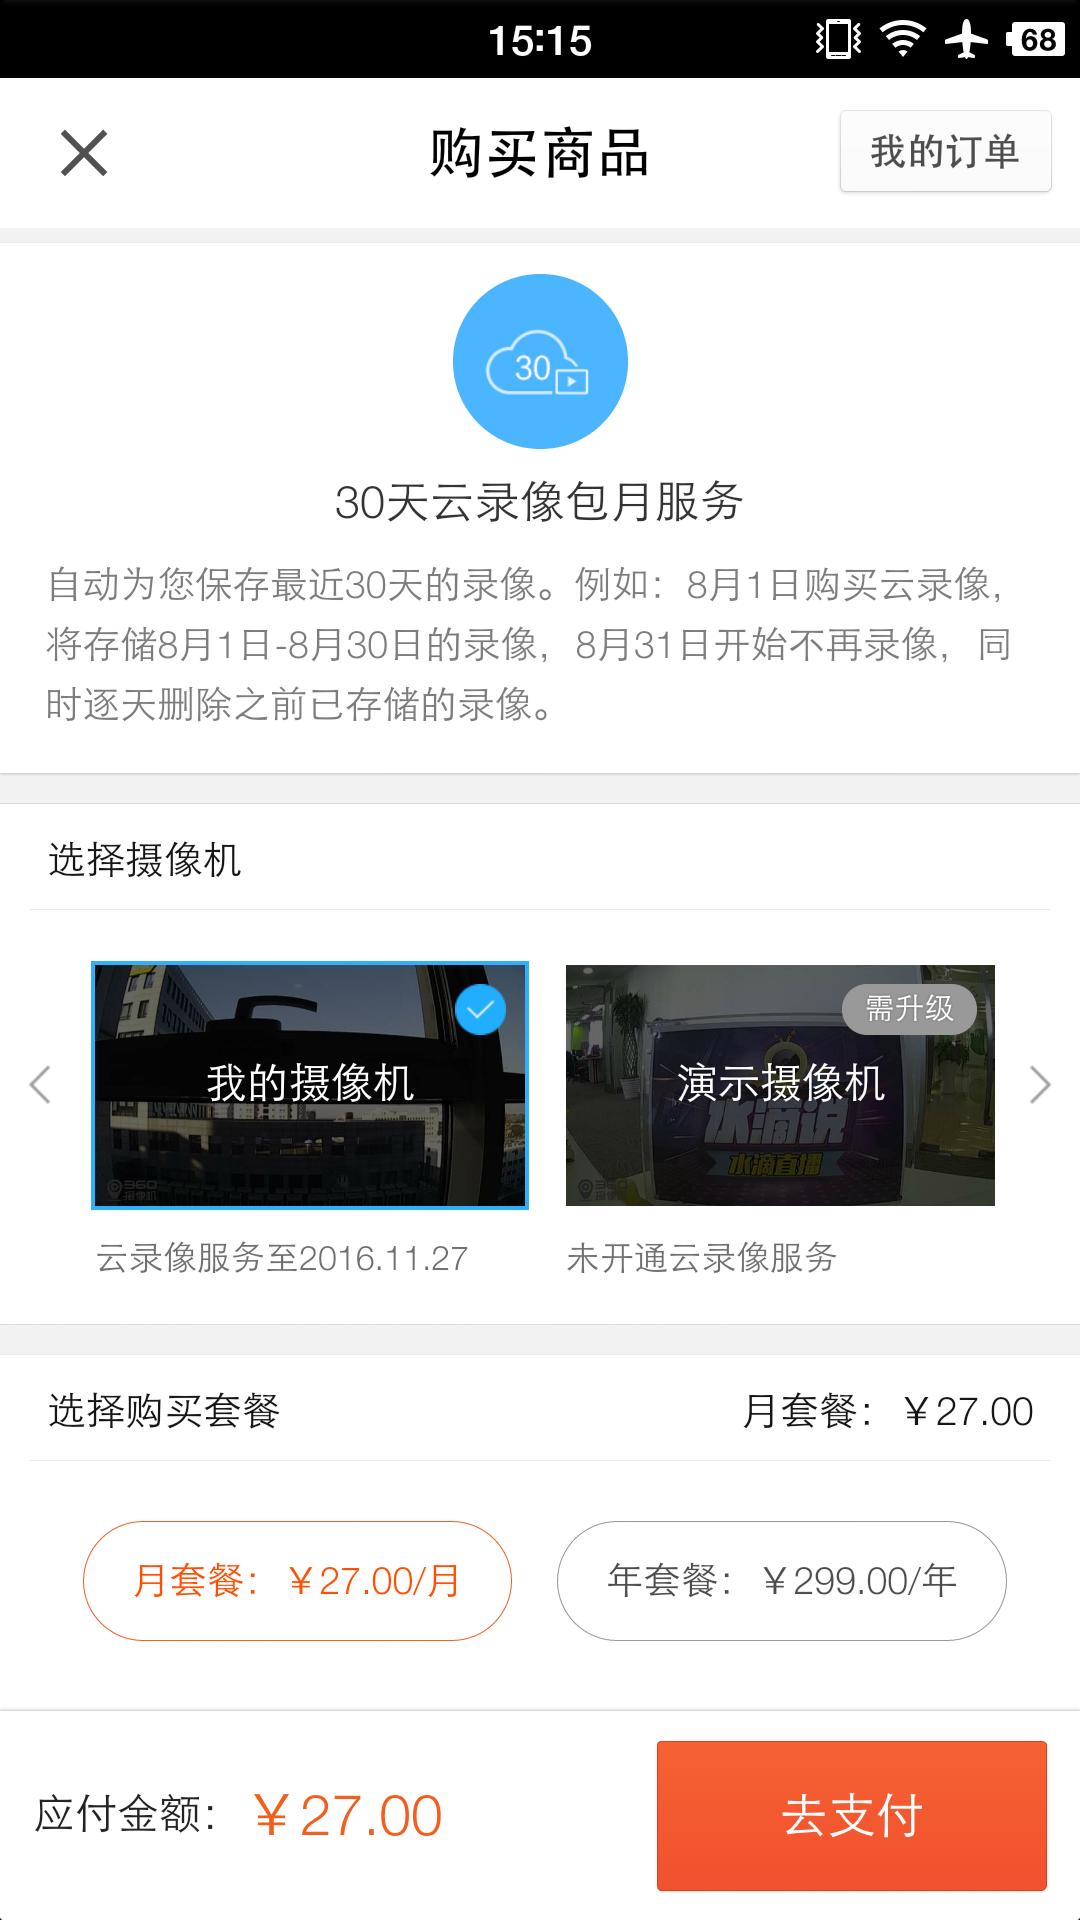 Screenshot_2015-10-30-15-15-32-141_360智能摄像机.png